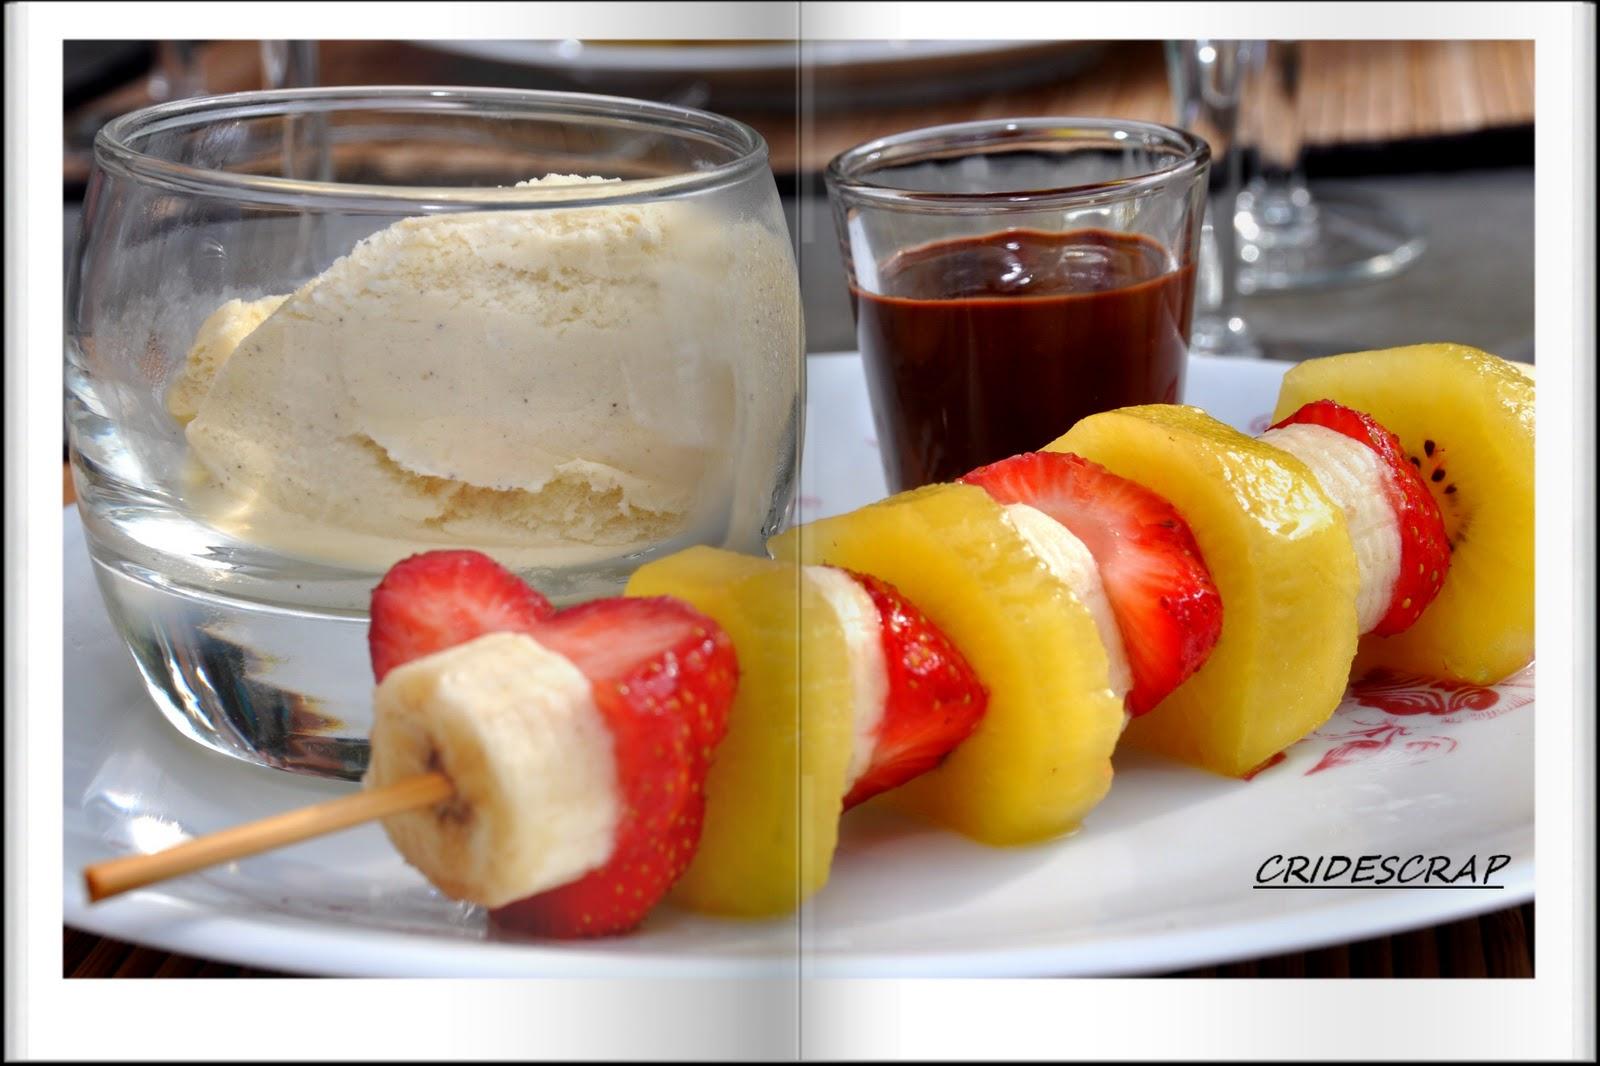 cridescrap and co brochette de fruits marin s au miel sa glace vanille et son chocolat fondu. Black Bedroom Furniture Sets. Home Design Ideas